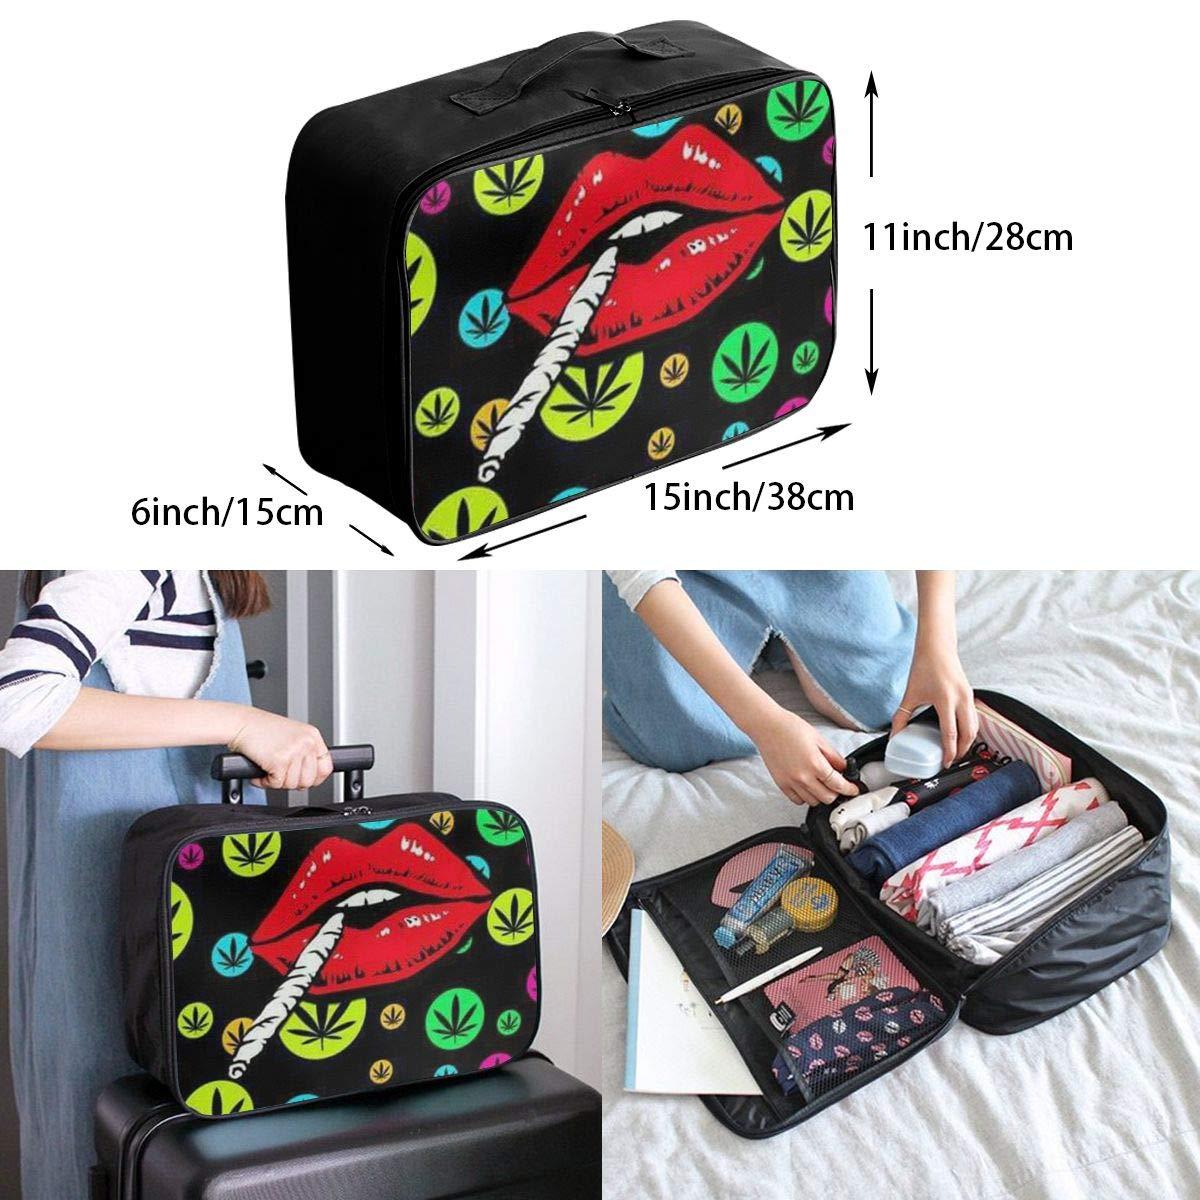 Colorful Marijuana Weed Leaf And Smoking Lip Travel Carry-on Luggage Weekender Bag Overnight Tote Flight Duffel In Trolley Handle